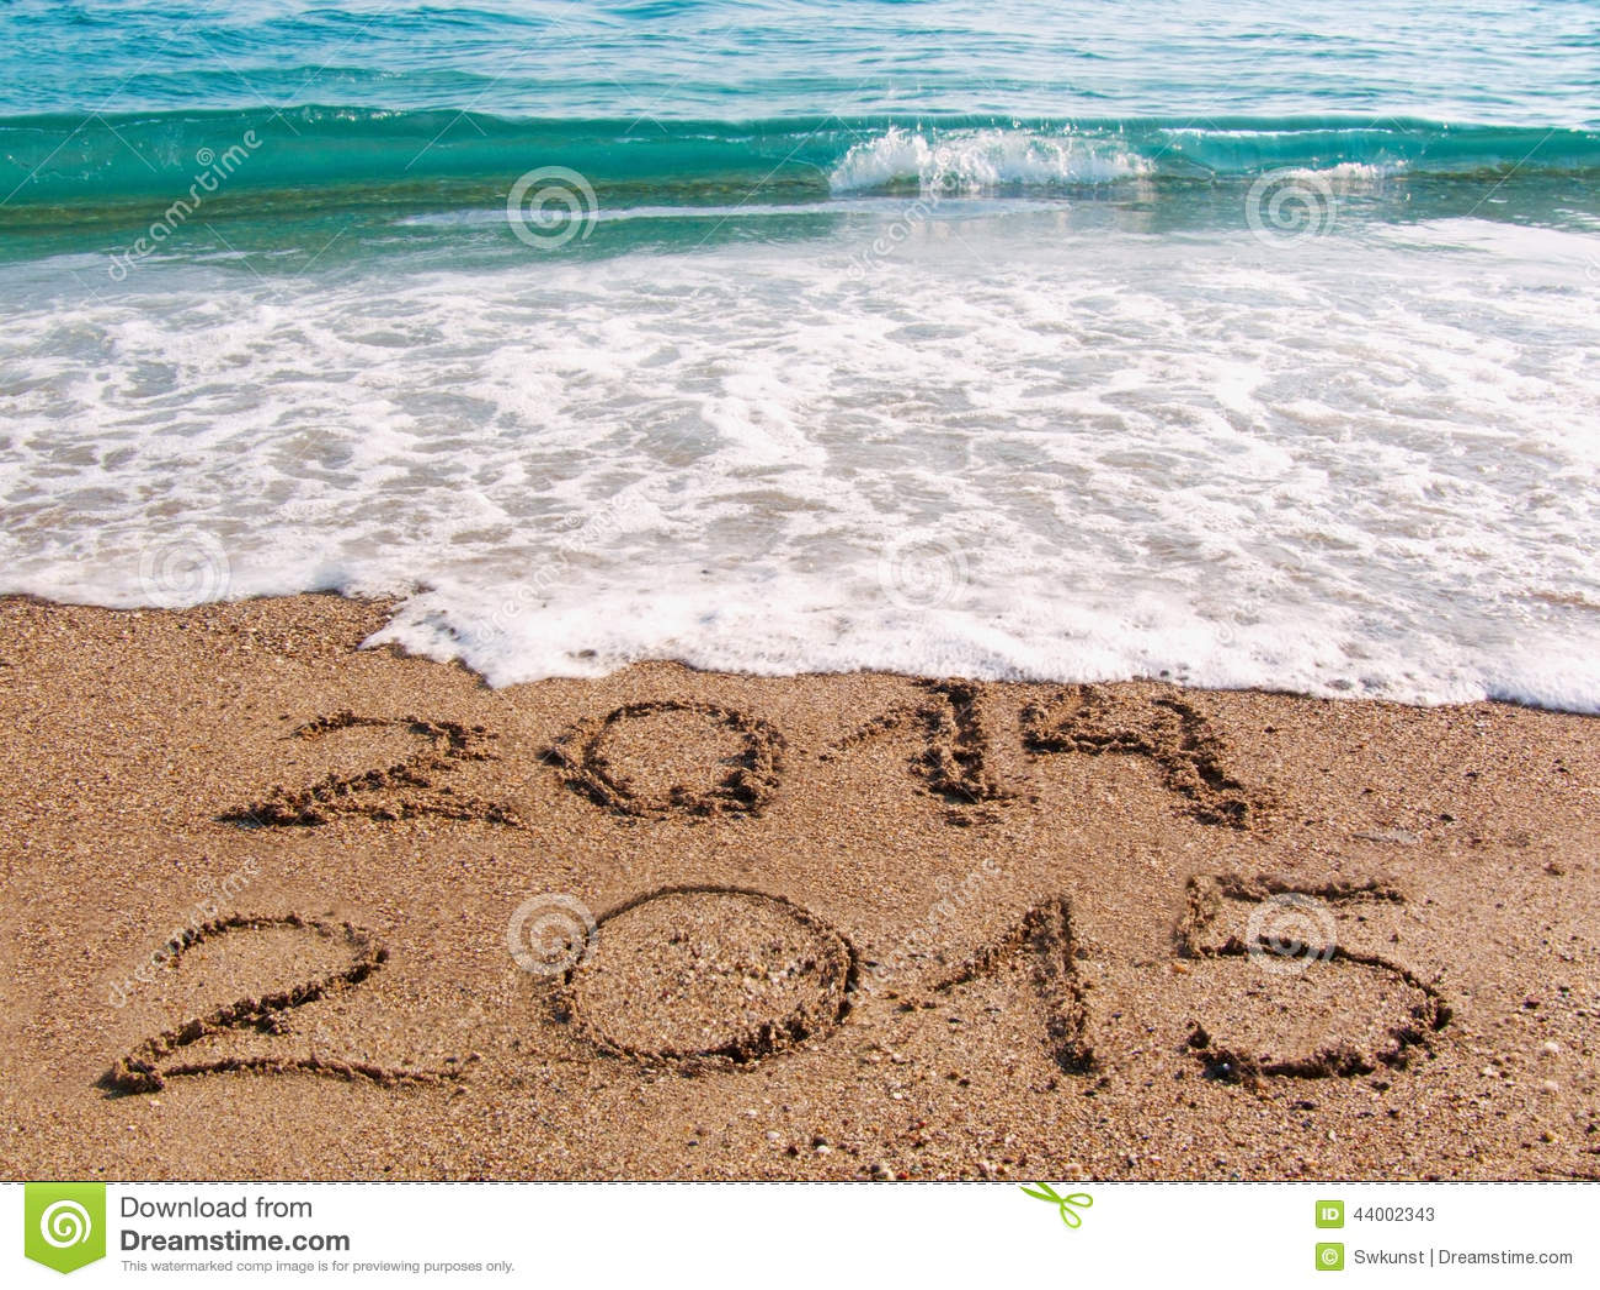 Happy New Year 2015 .